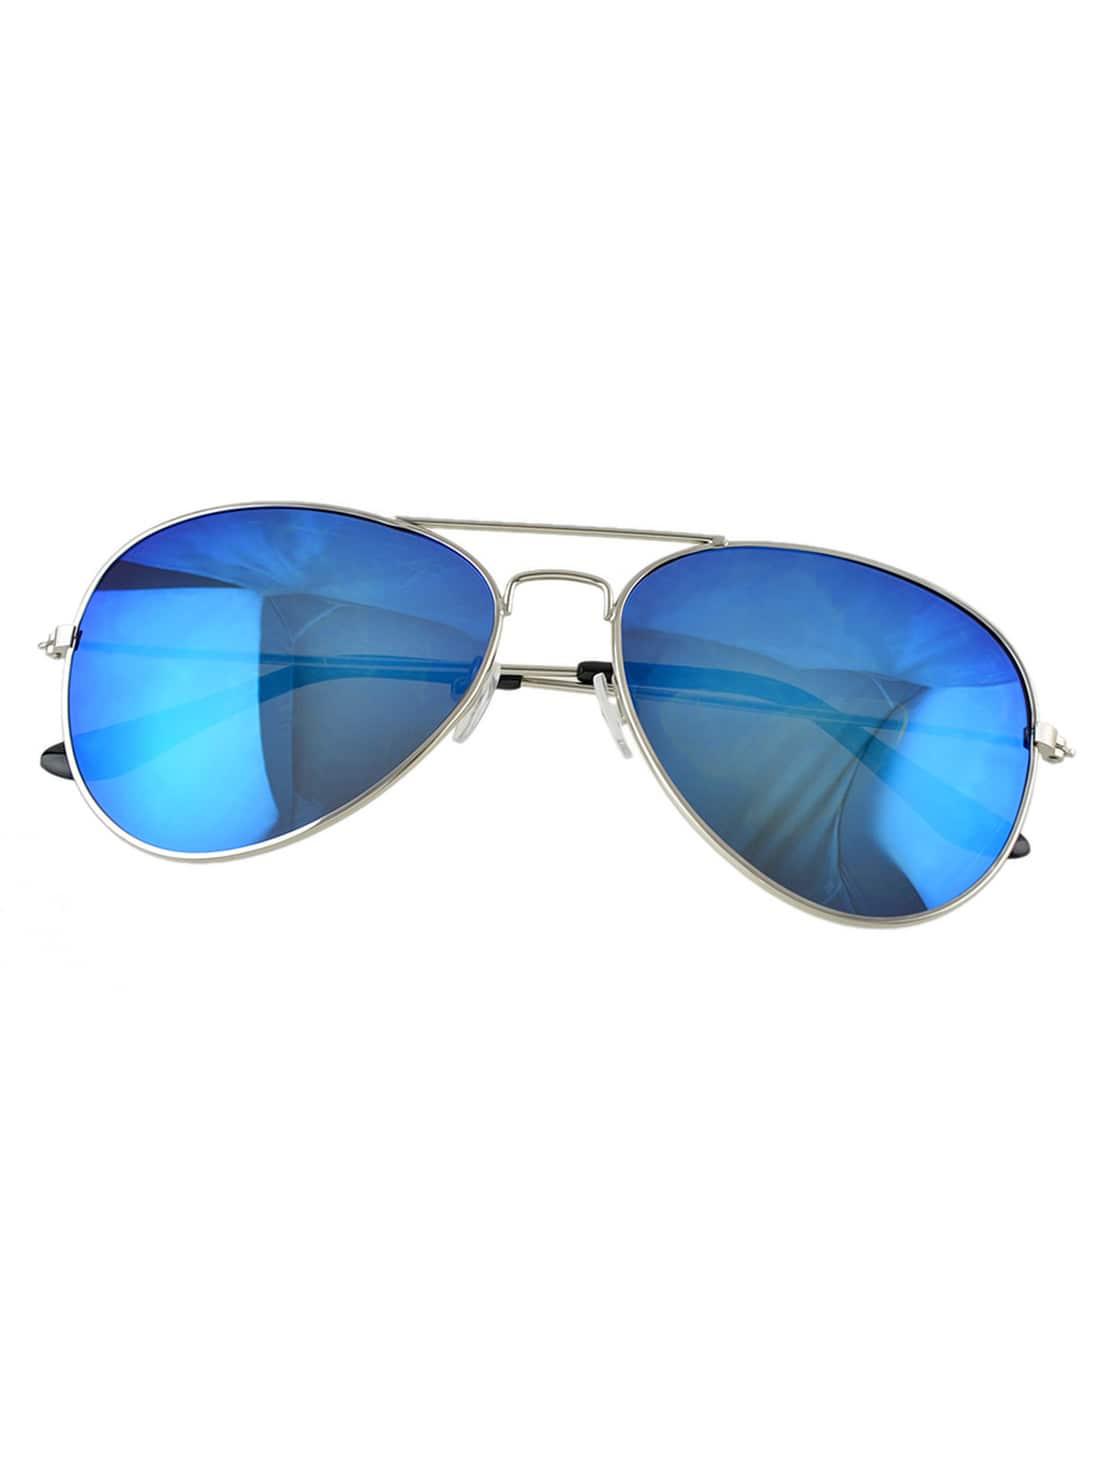 Blue Lenses Silver Thin Rim Sunglasses